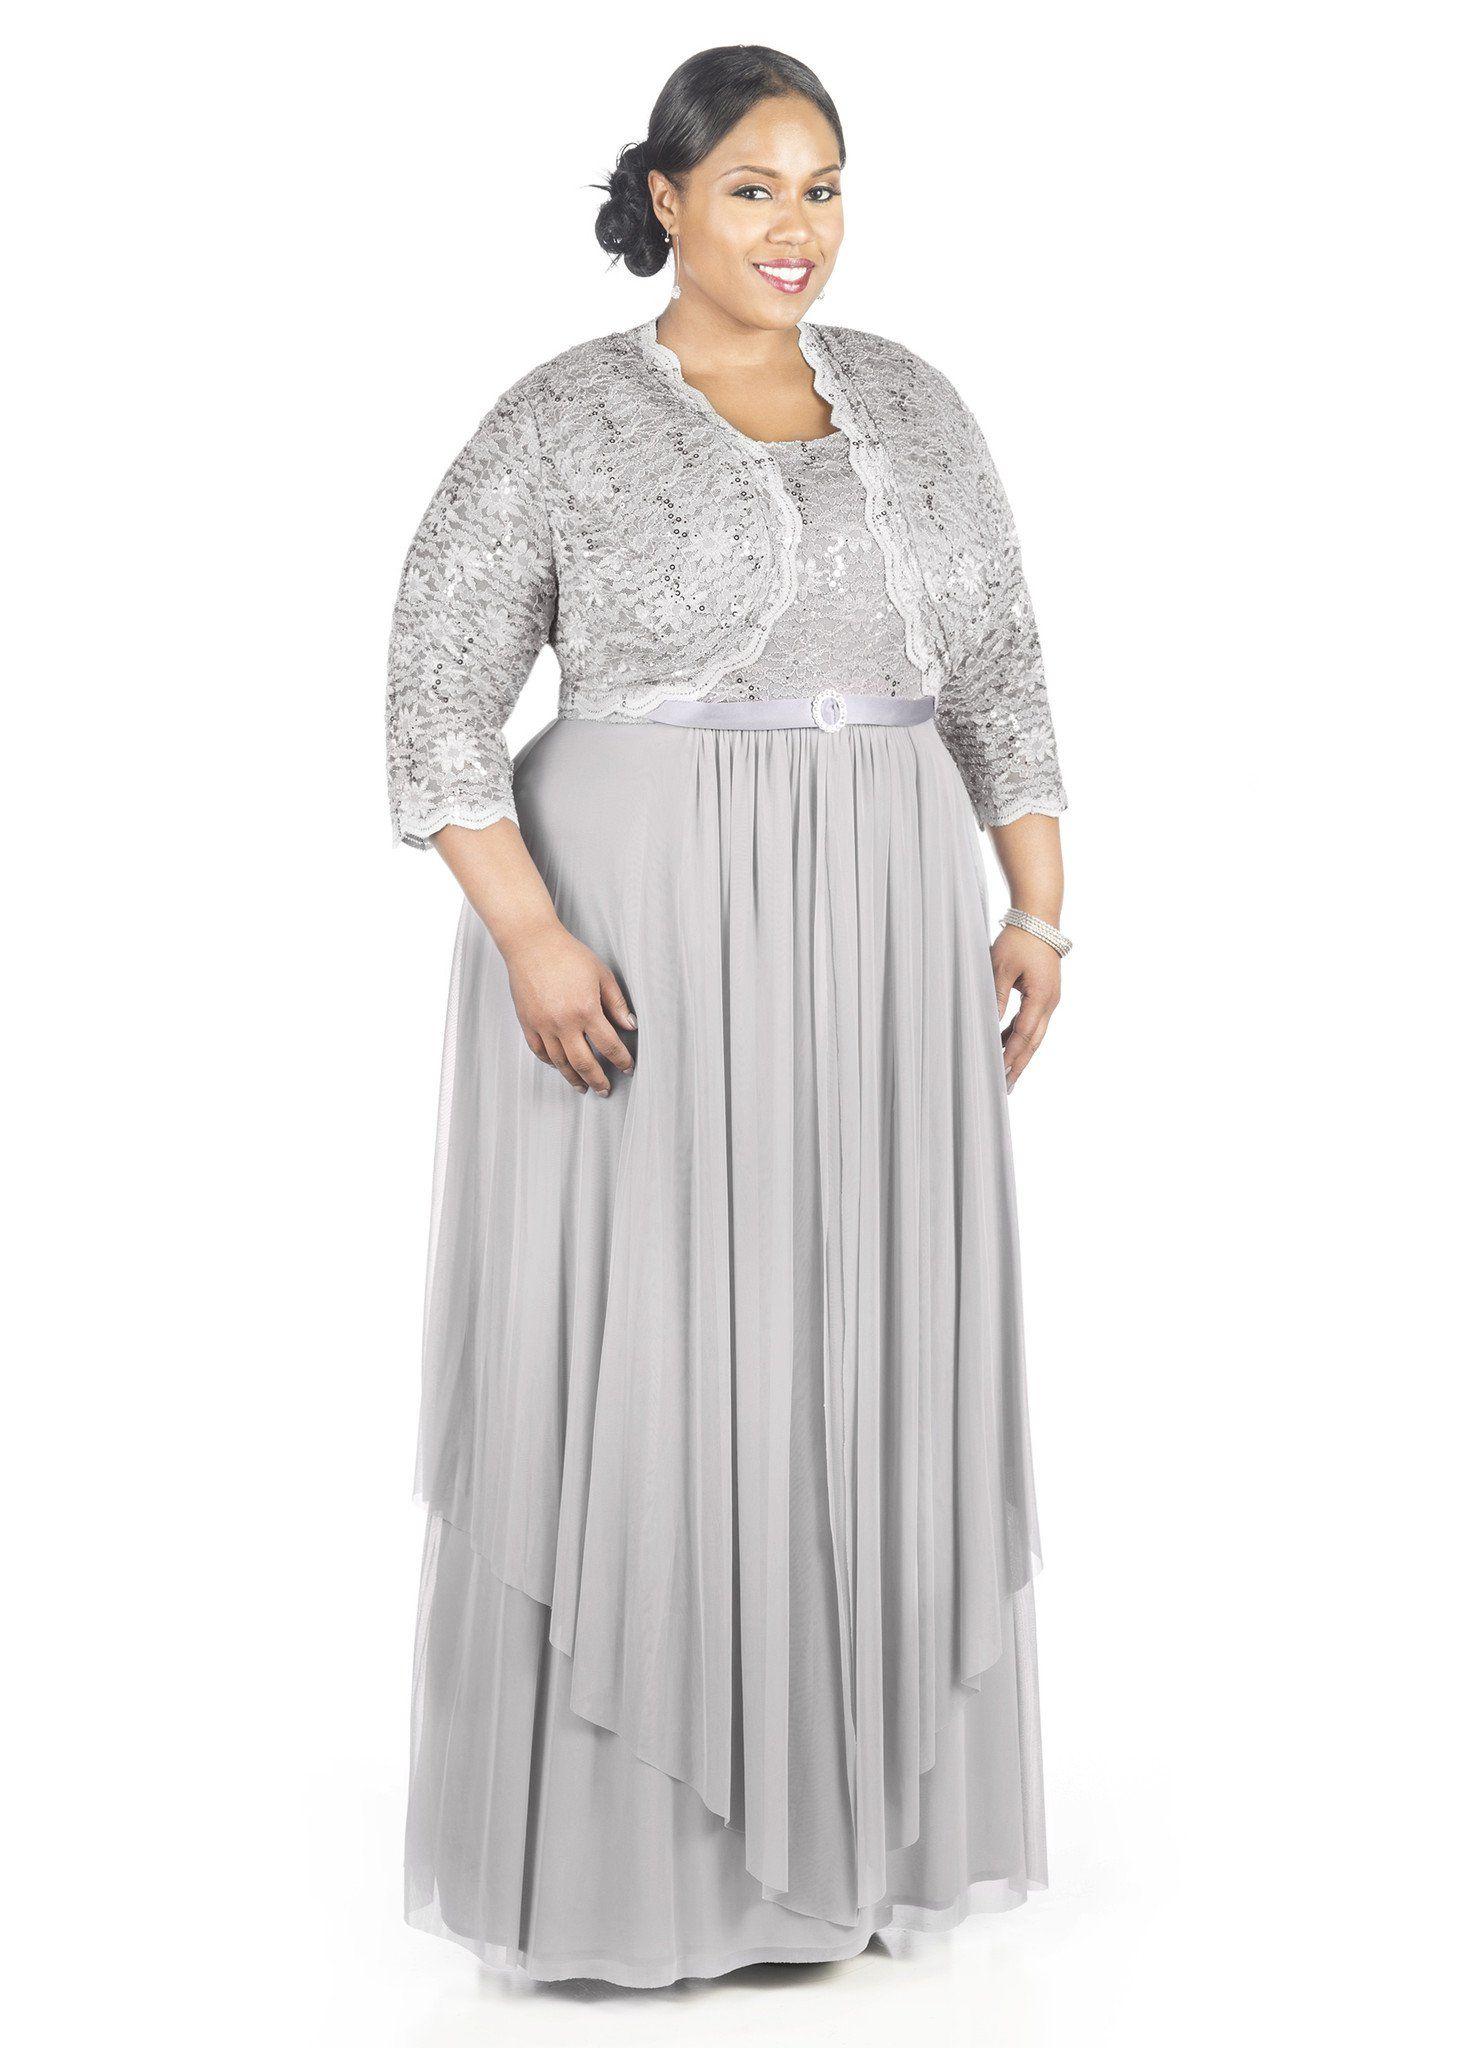 a106d4cfbd0 R M Richards Women s Plus Size Formal Jacket Dress - Mother of the Bride  Dress